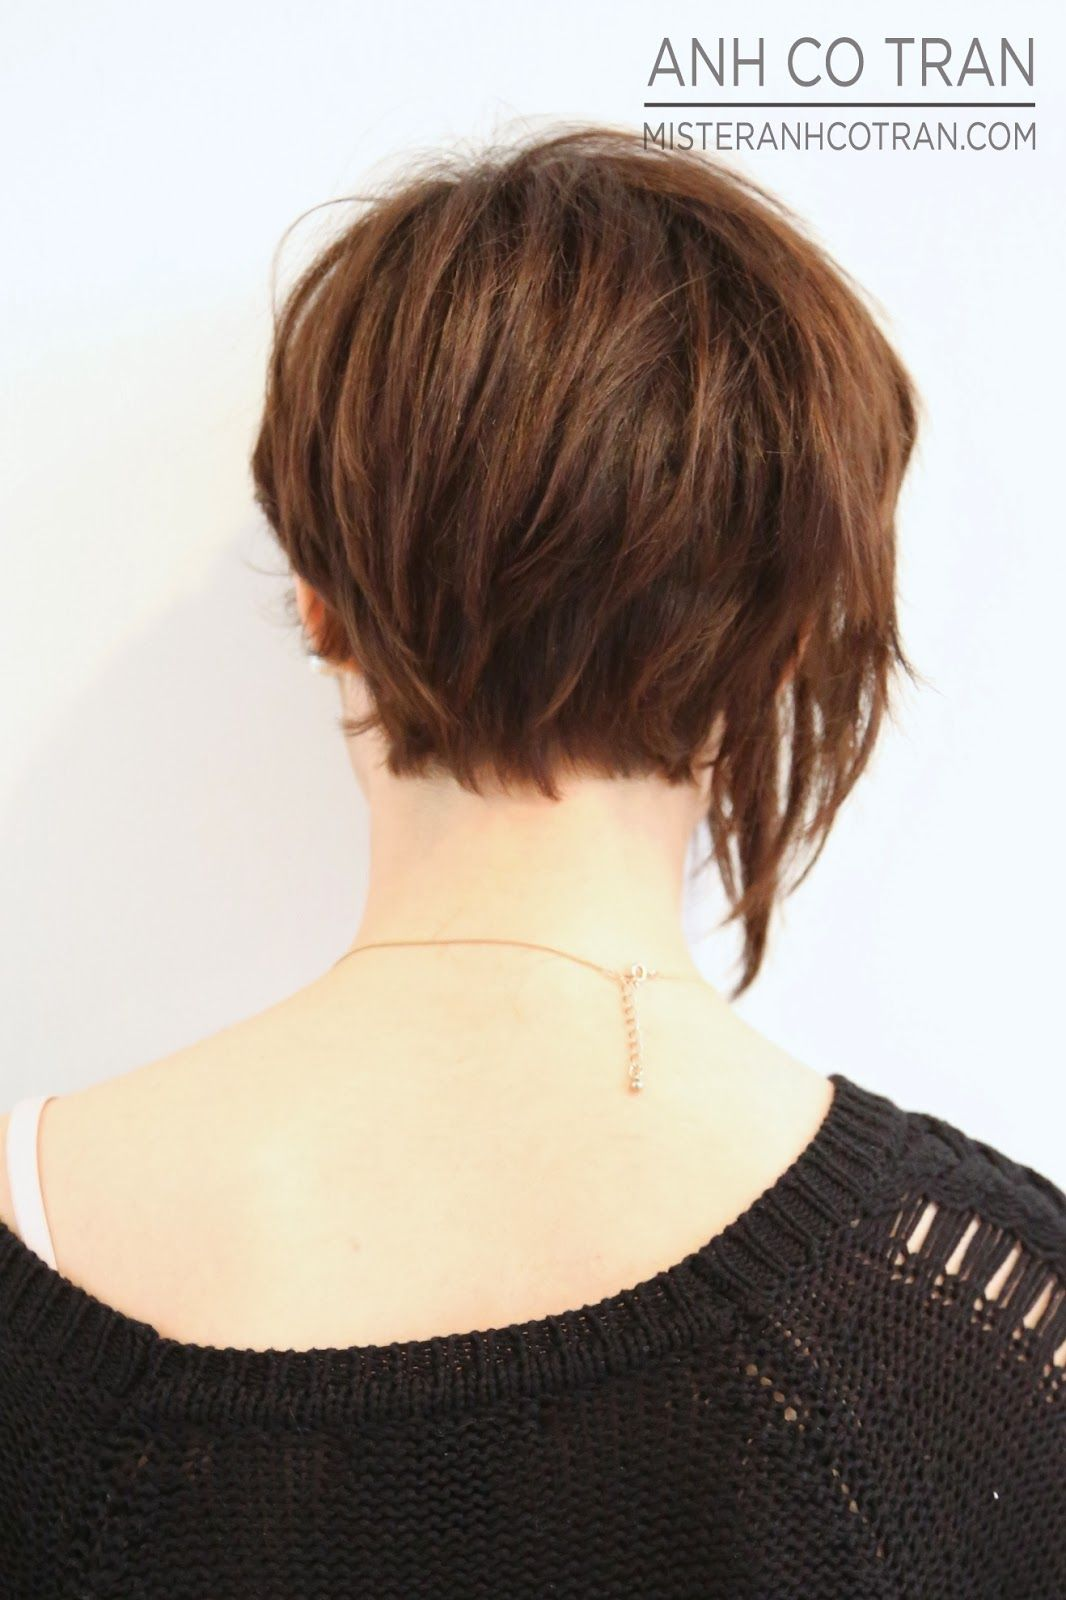 Asymmetrical short hairstyle brown short hair i like the back of asymmetrical short hairstyle brown short hair i like the back of this one winobraniefo Choice Image